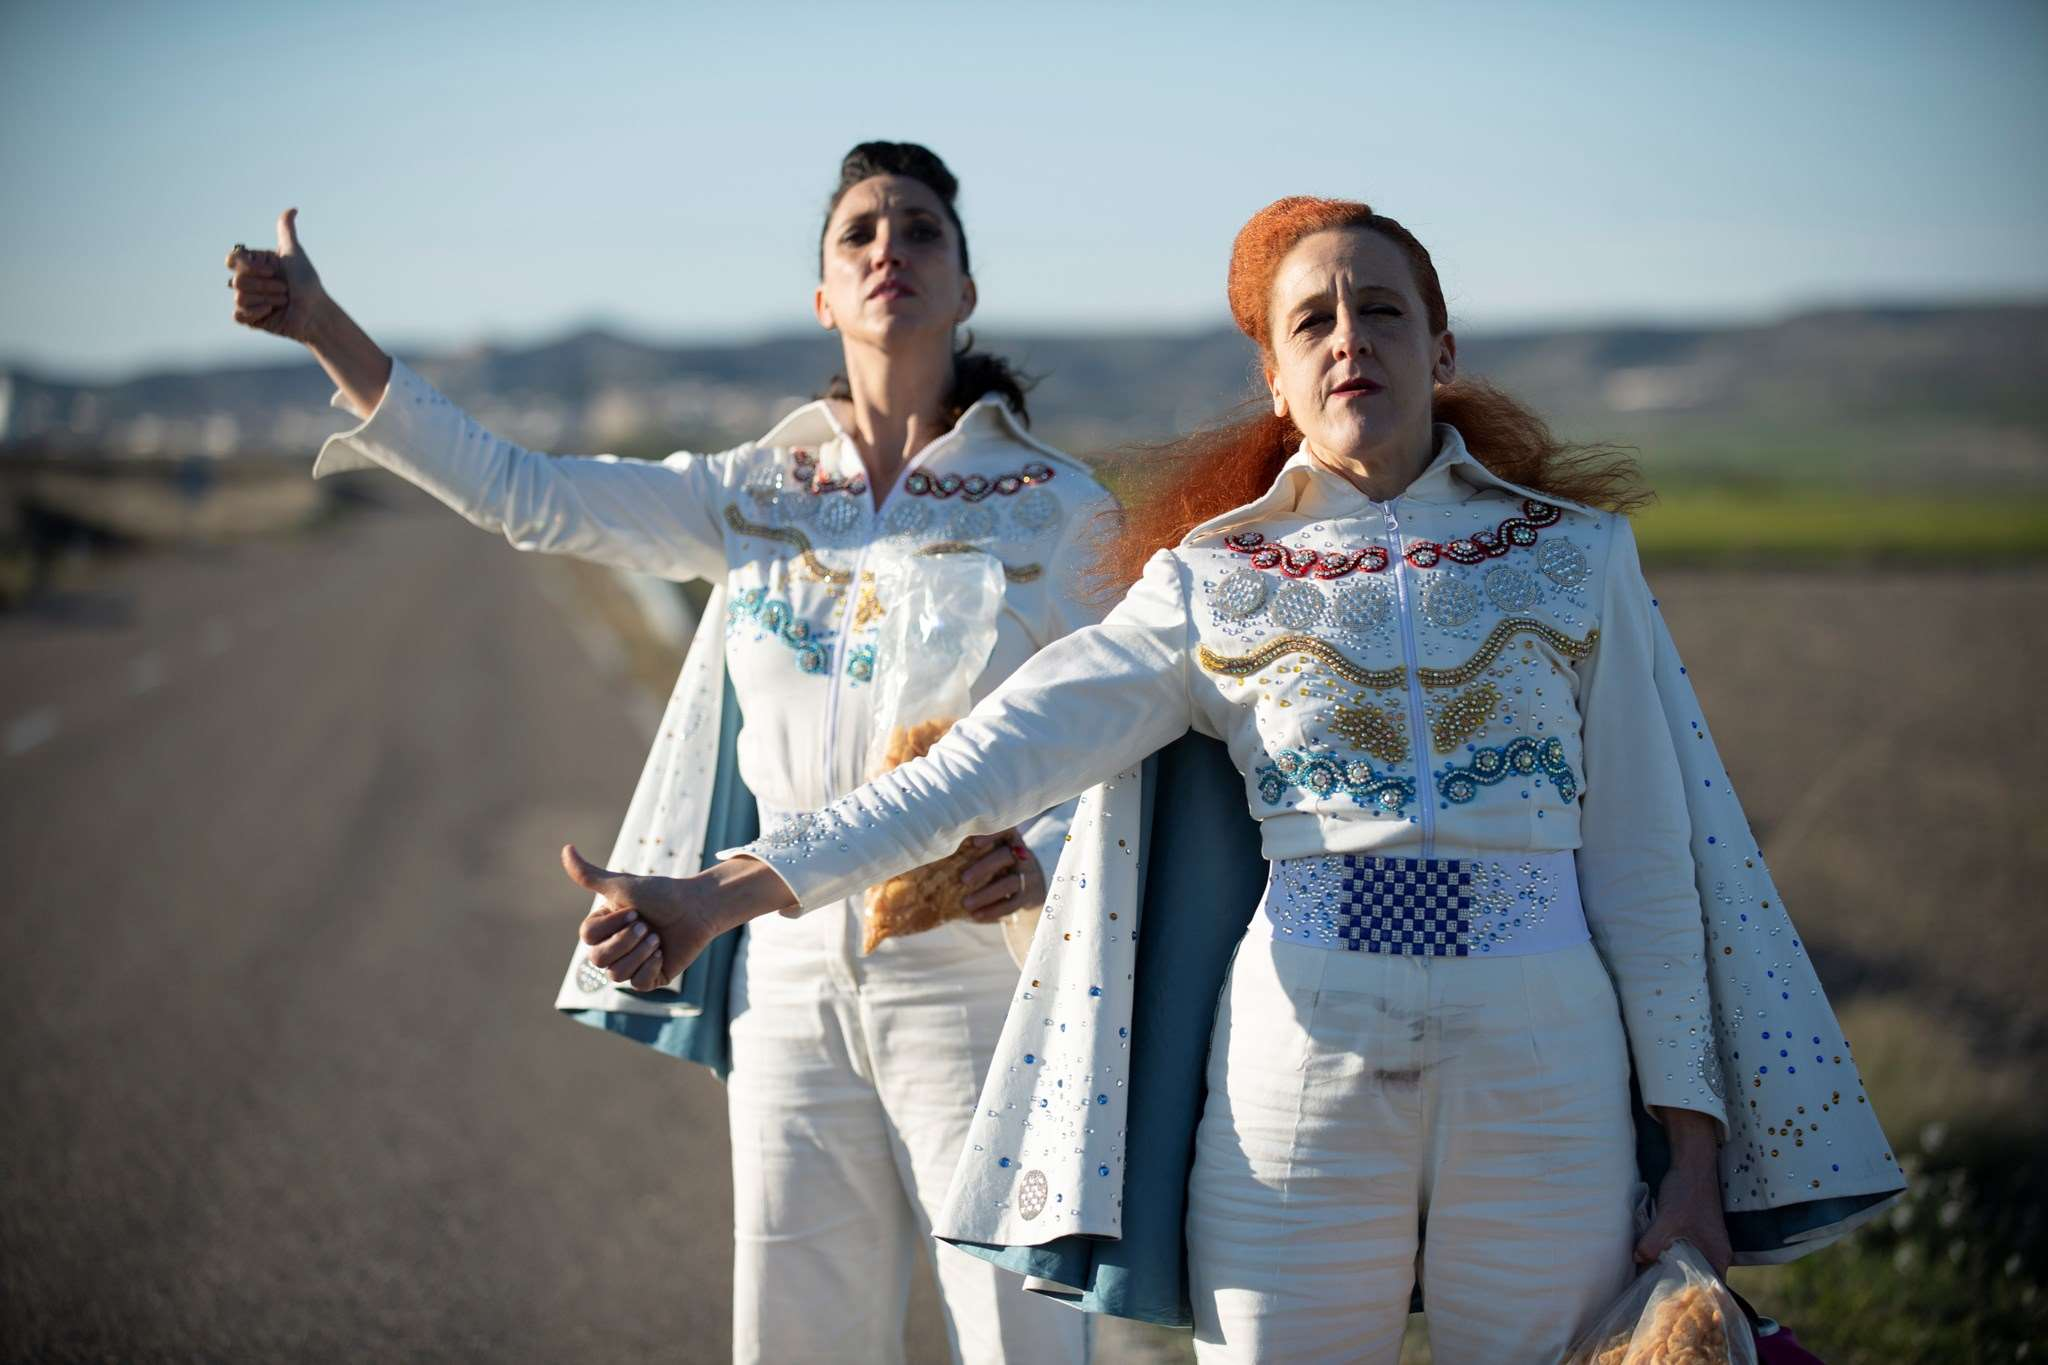 'ALOHA FROM HAWAII' · Vero Cendoya I Mar Gómez - Dansa / Públic Familiar